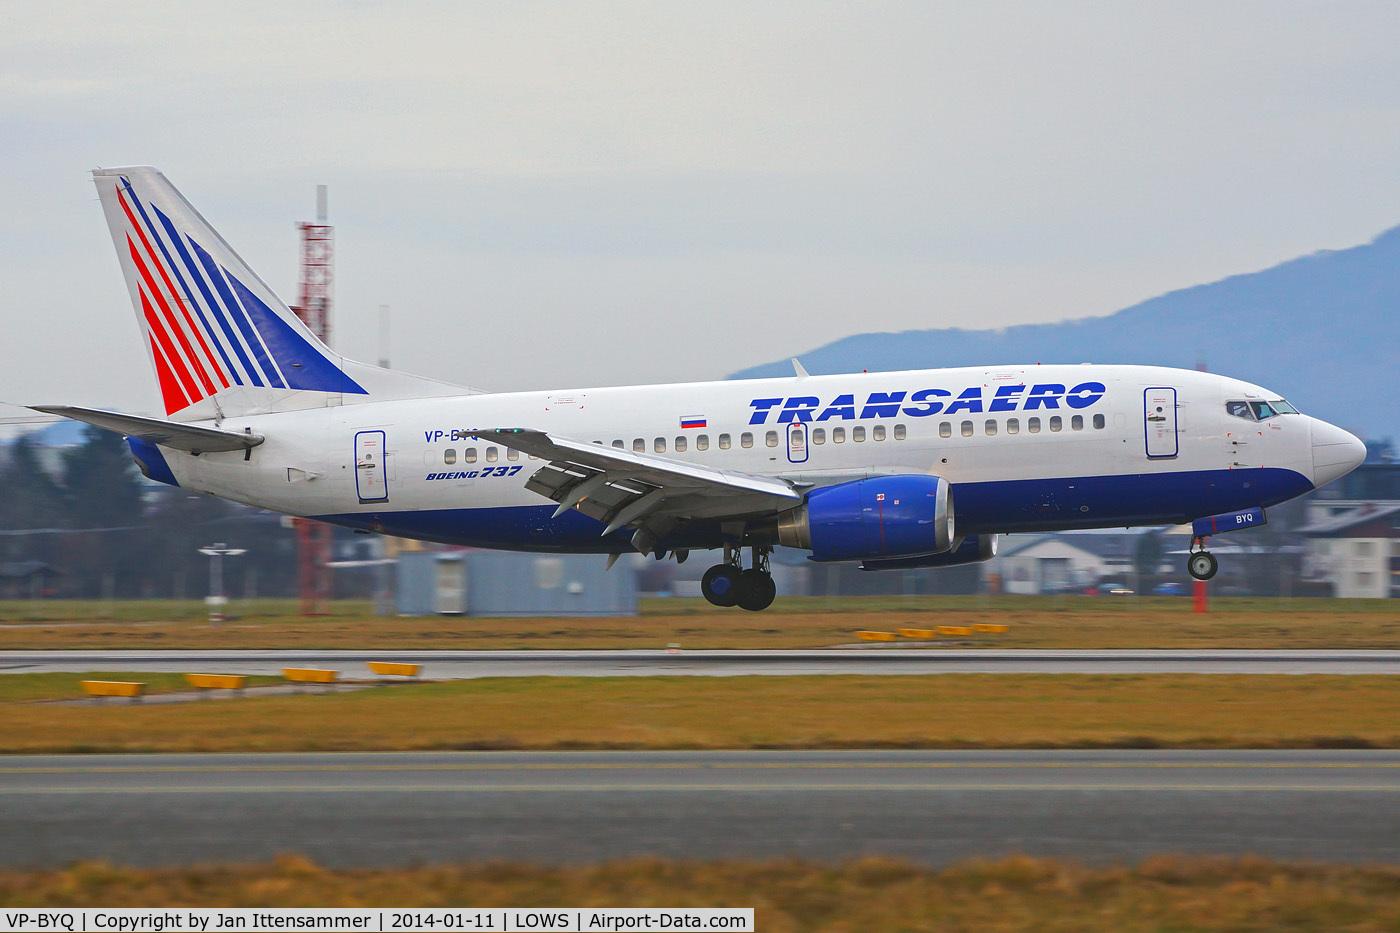 VP-BYQ, 1998 Boeing 737-524 C/N 28919, vp-byq